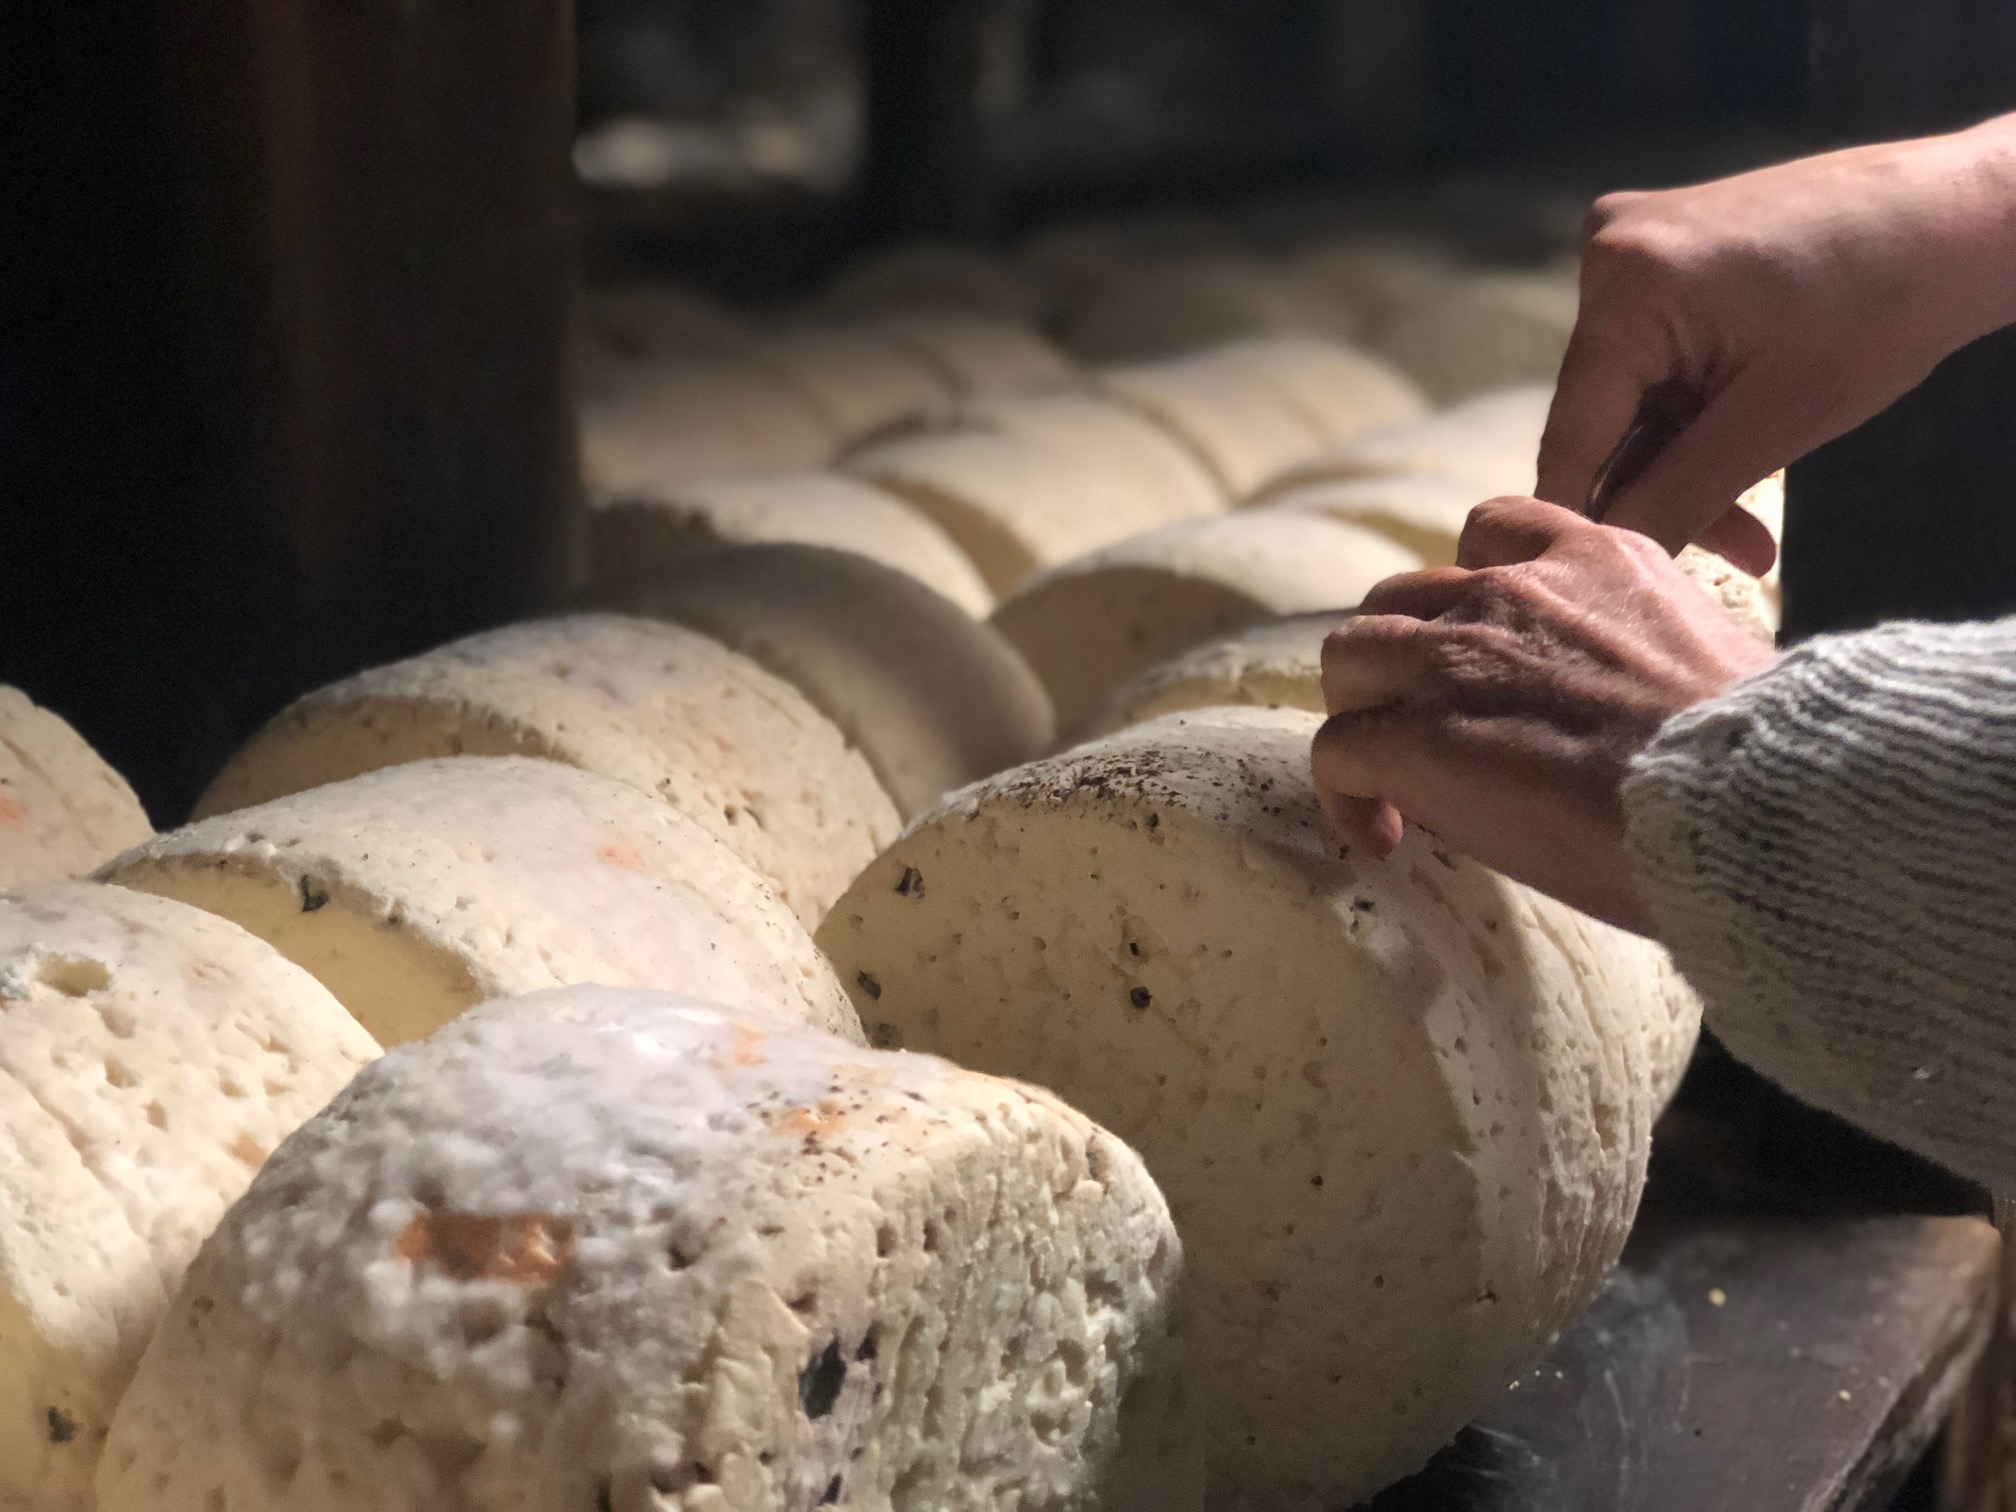 Caves de notre Roquefort Carles, dernier artisan fabricant de Roquefort